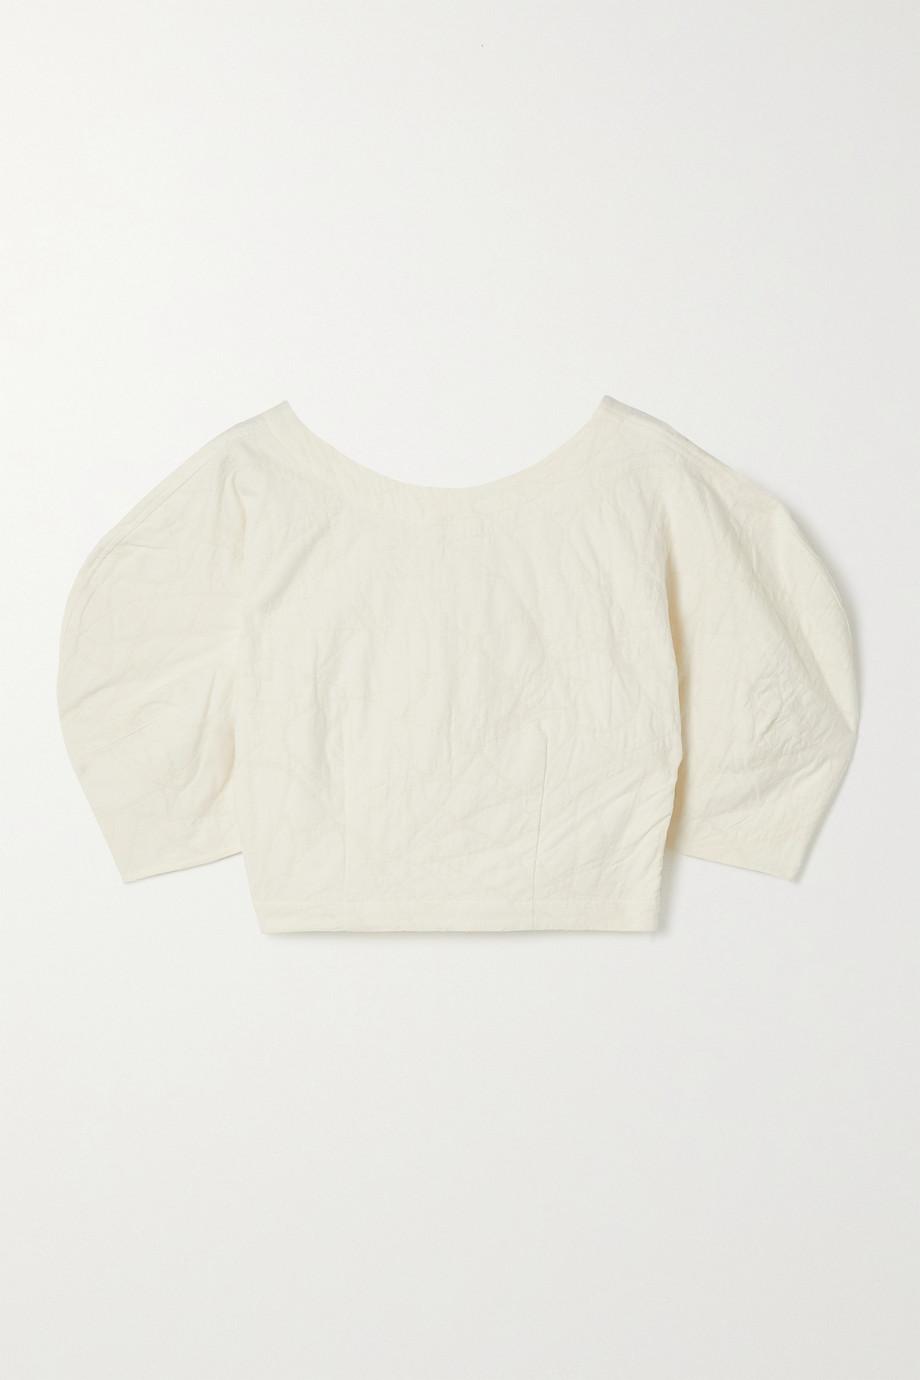 Mara Hoffman + NET SUSTAIN Peni organic cotton and linen-blend jacquard top